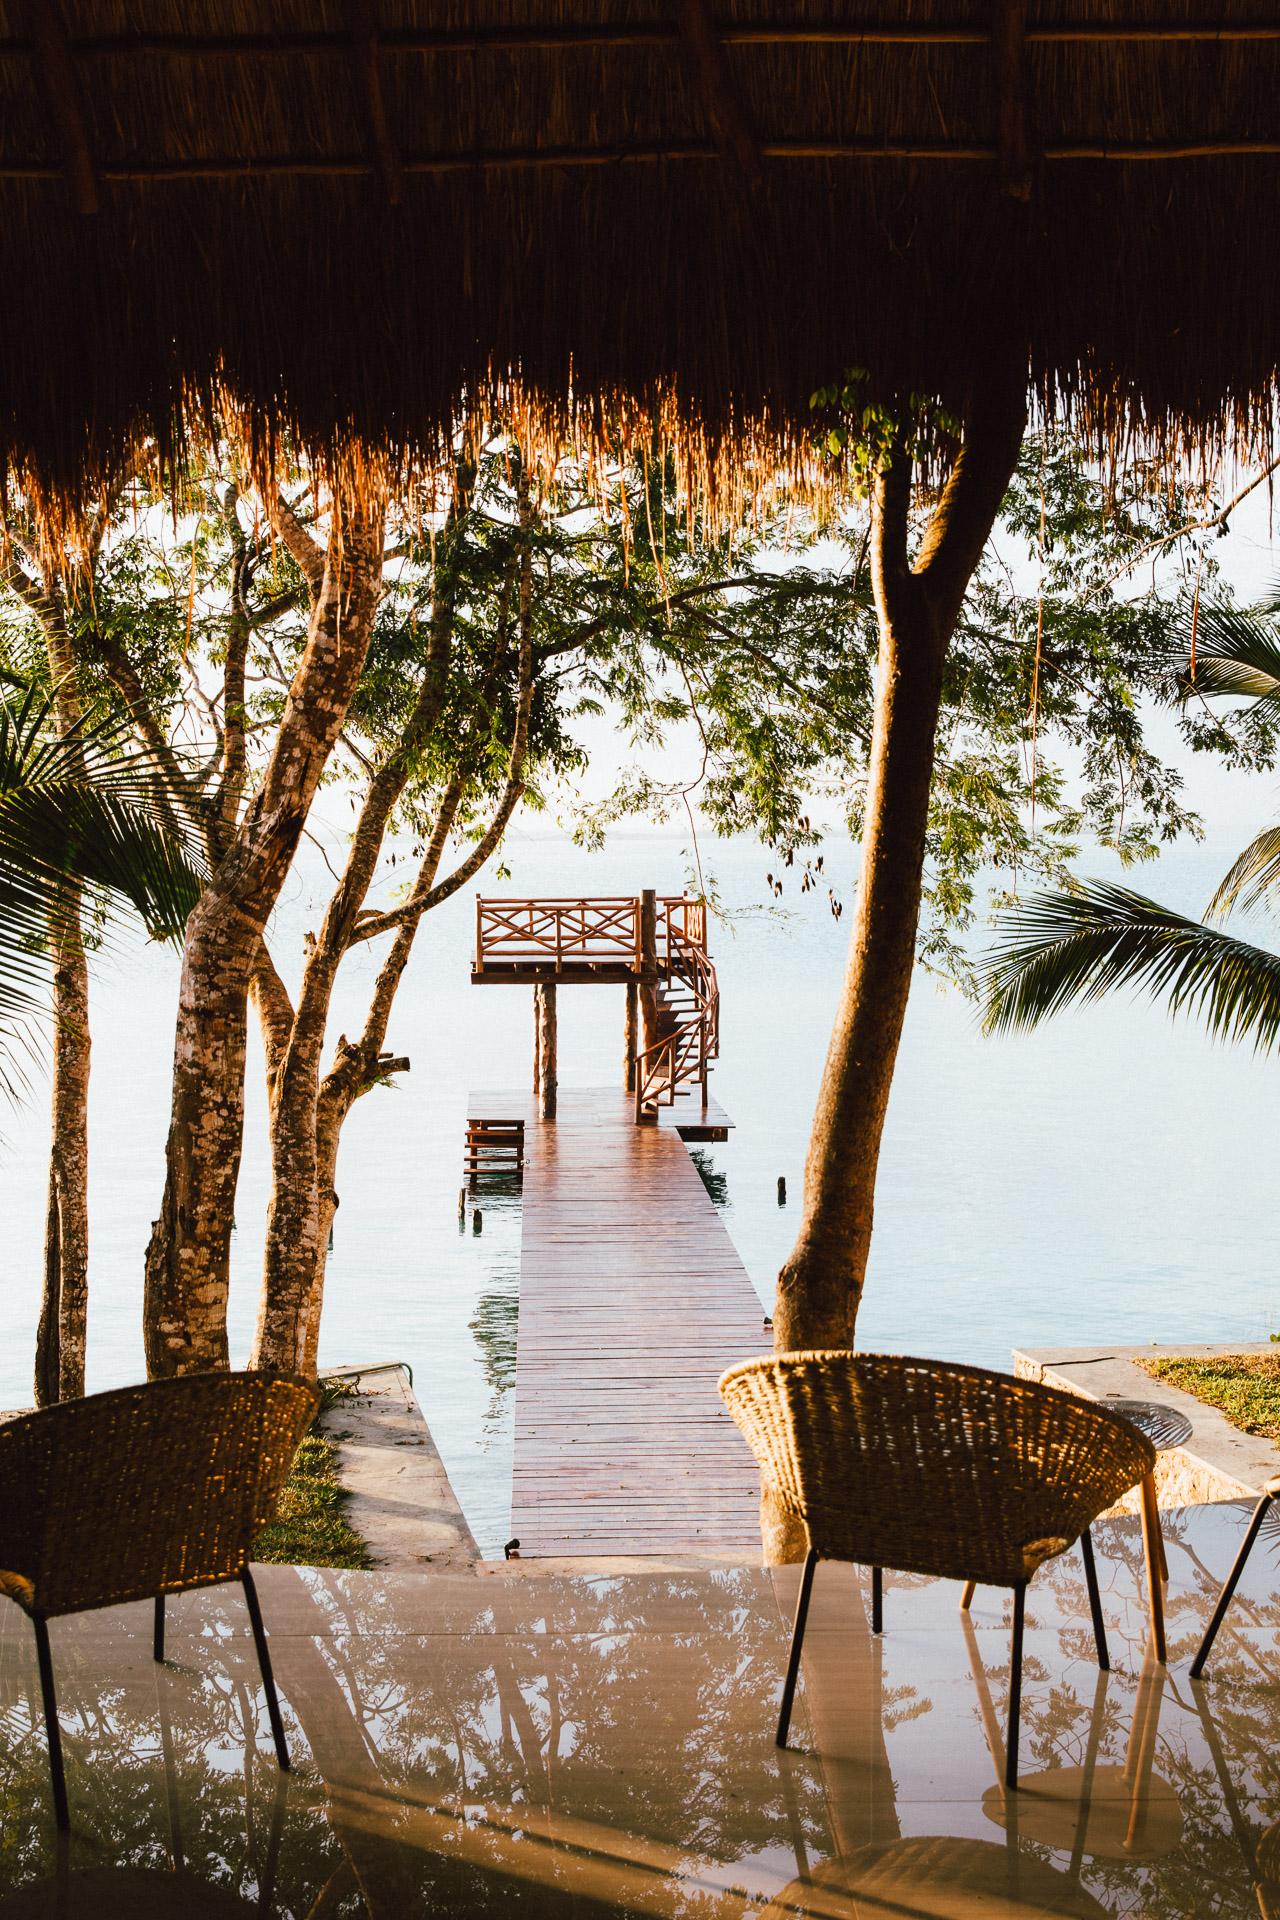 mexico-luxury-hotel-photographer-riviera-maya-mia-bacalar-21.jpg